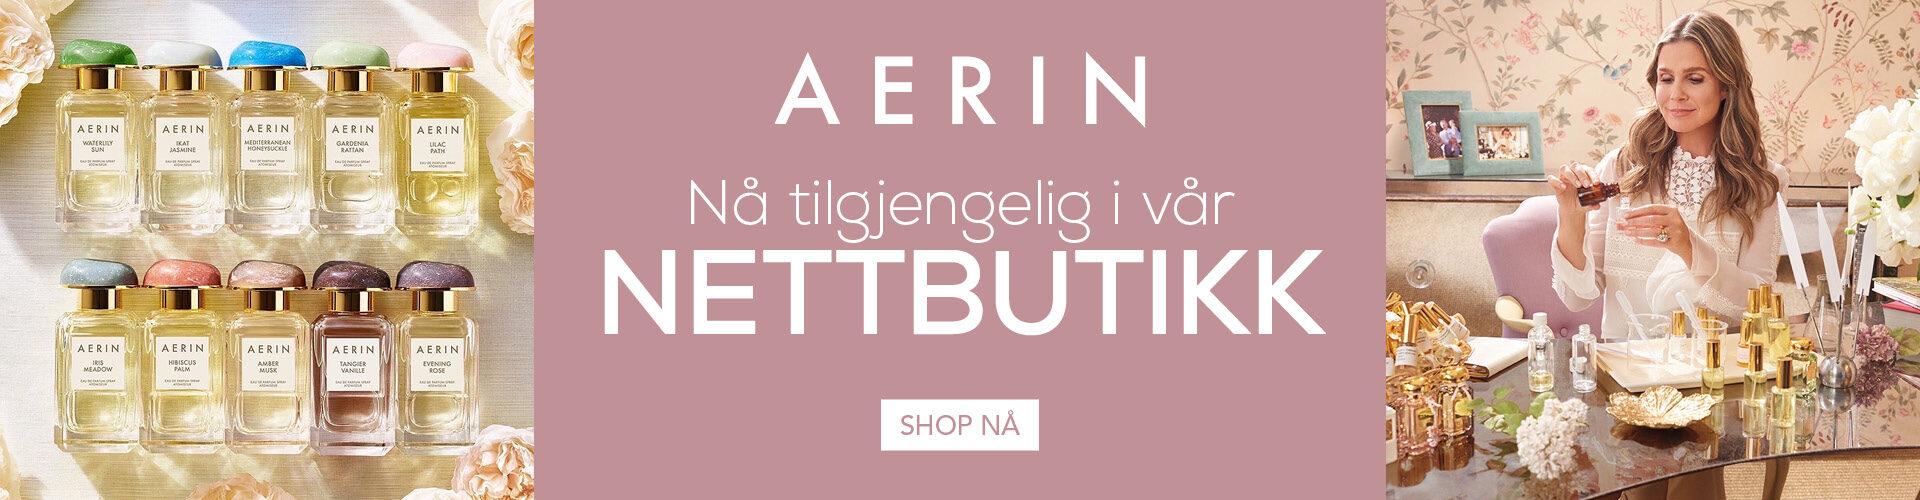 aerin_hero_desktop_1920x500px